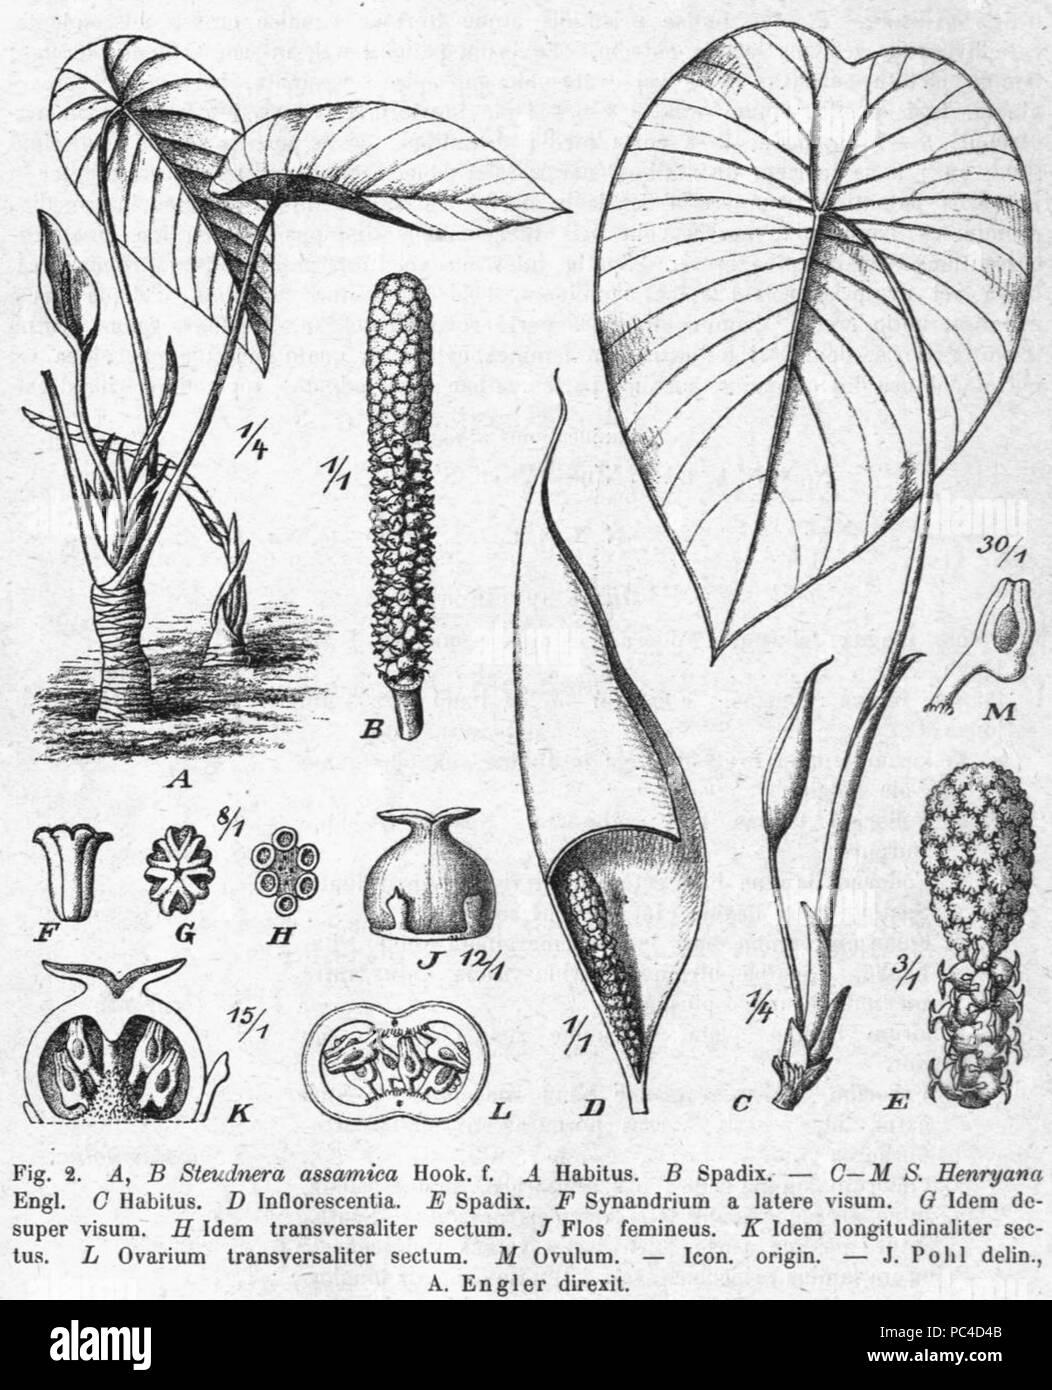 576 Steudnera assamica Pflanzenreich - Stock Image